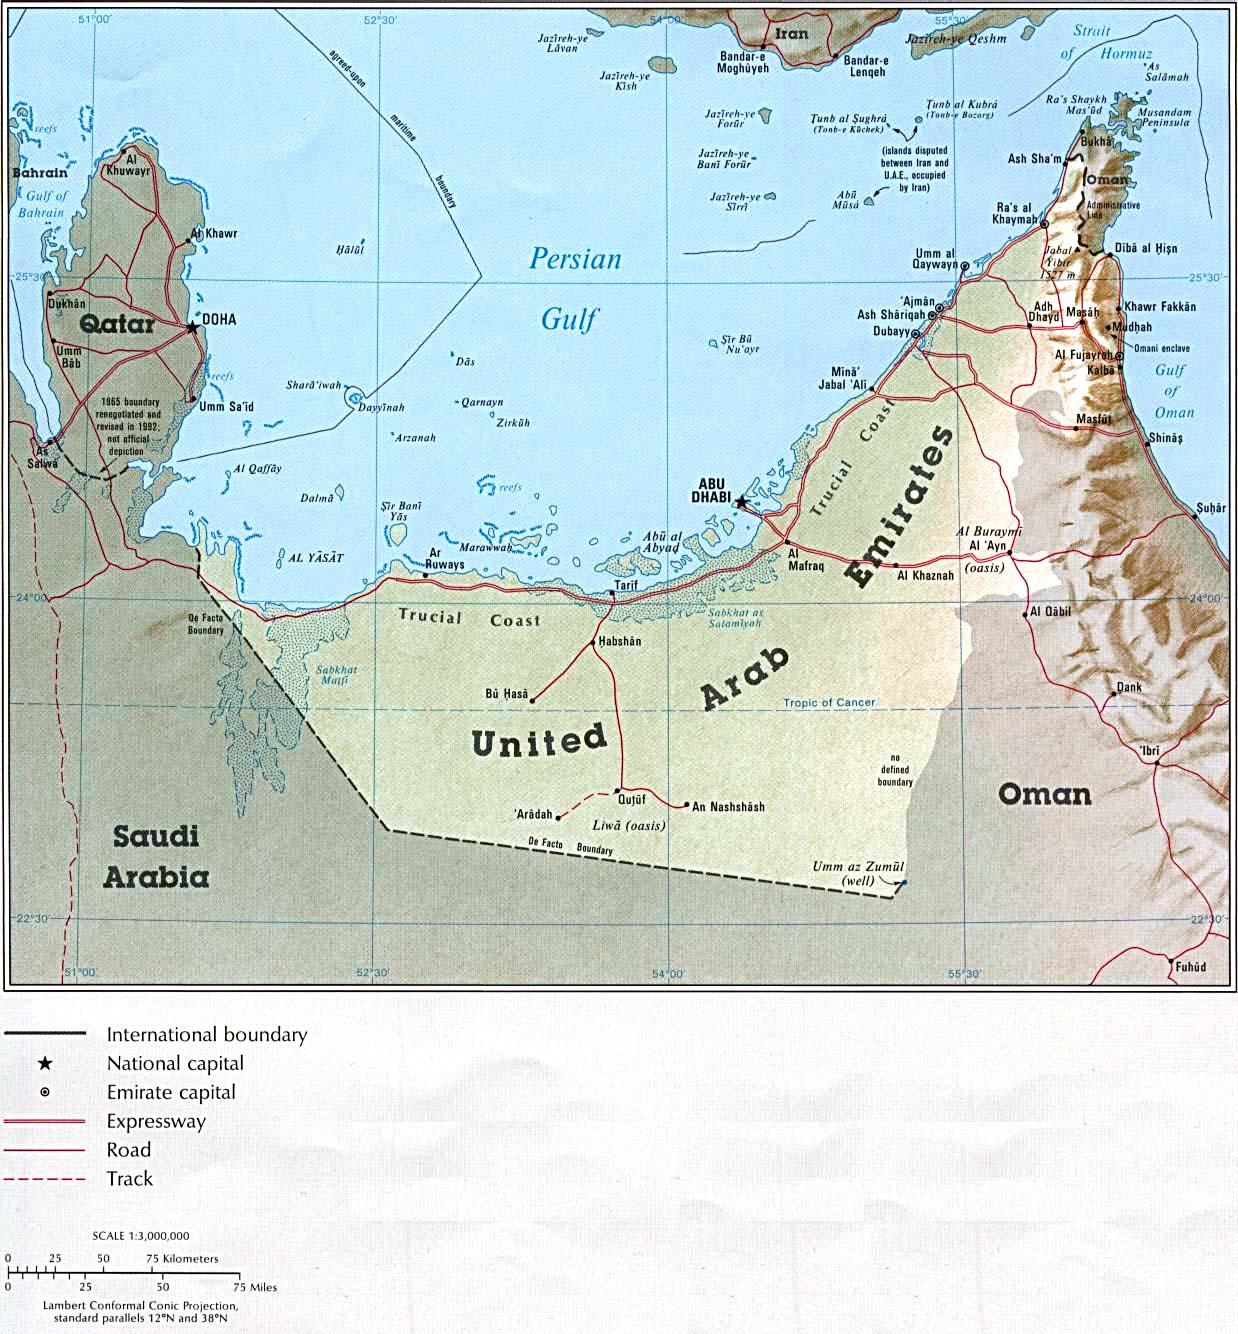 Map of United Arab Emirates (Relief Map) : Weltkarte.com ...